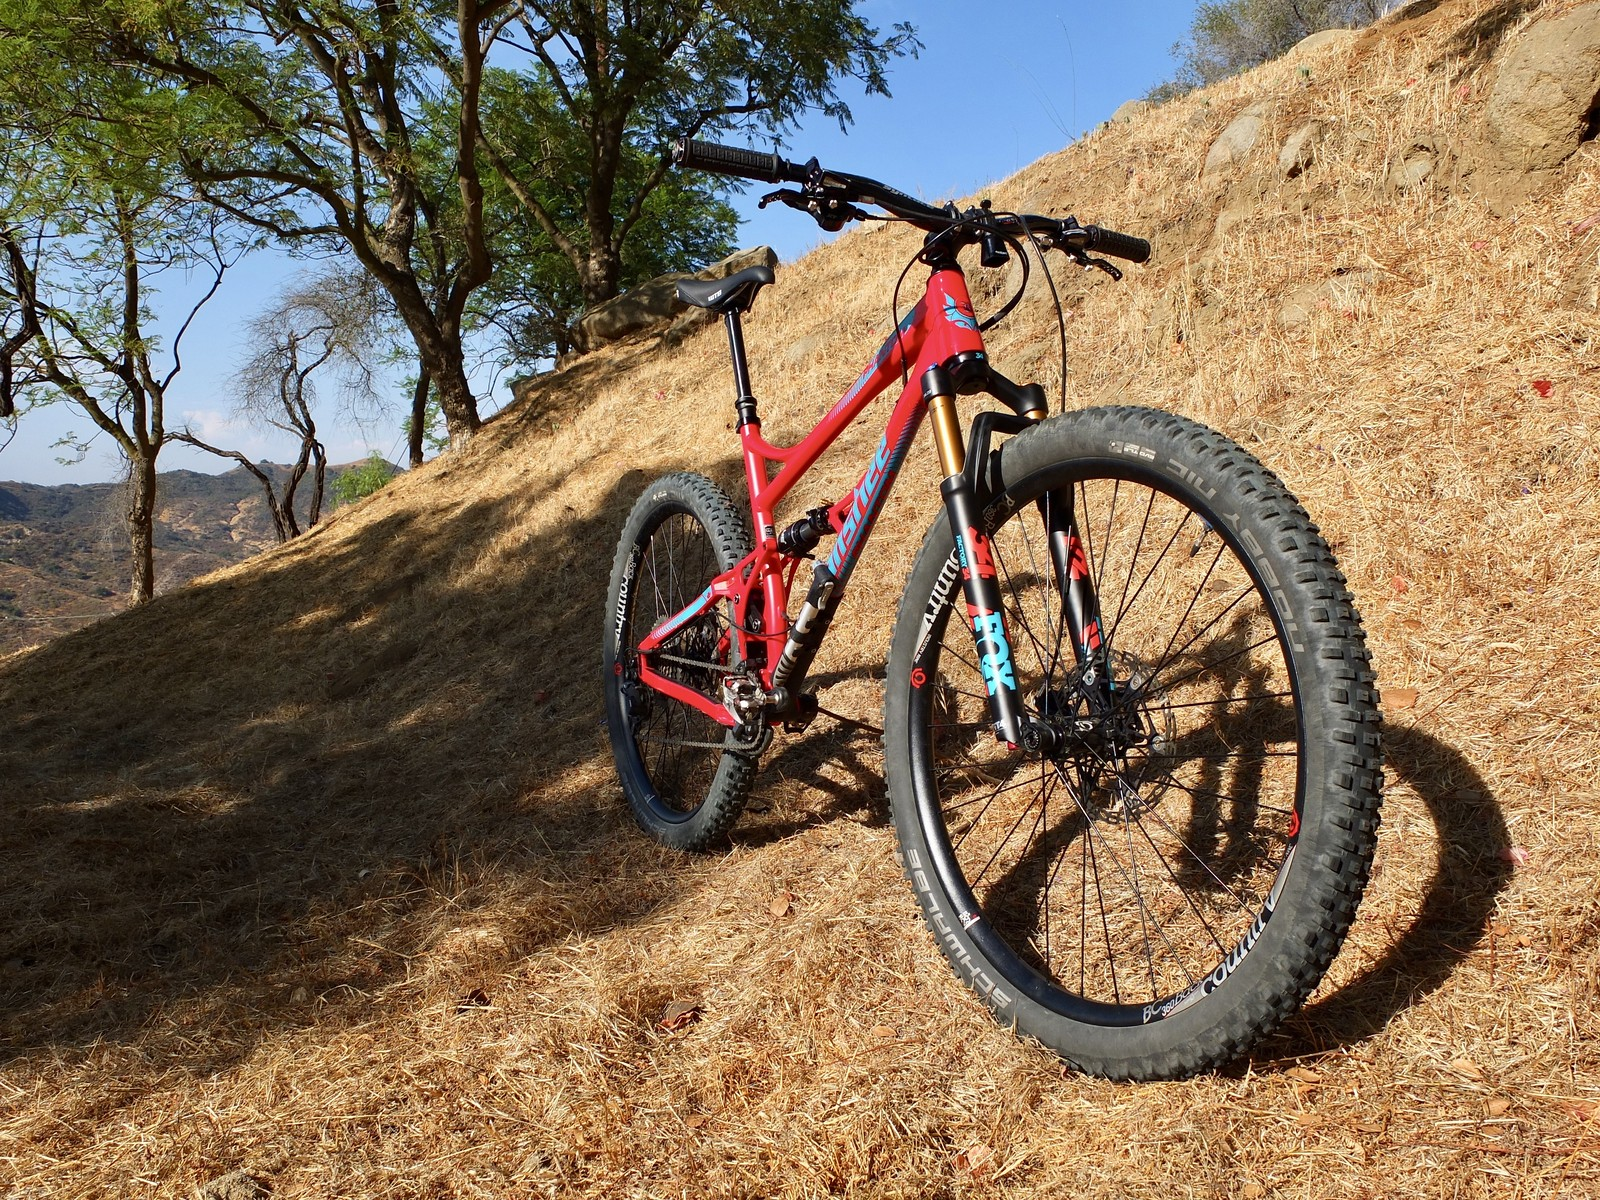 Banshee Phantom, not your grandpa's trail bike